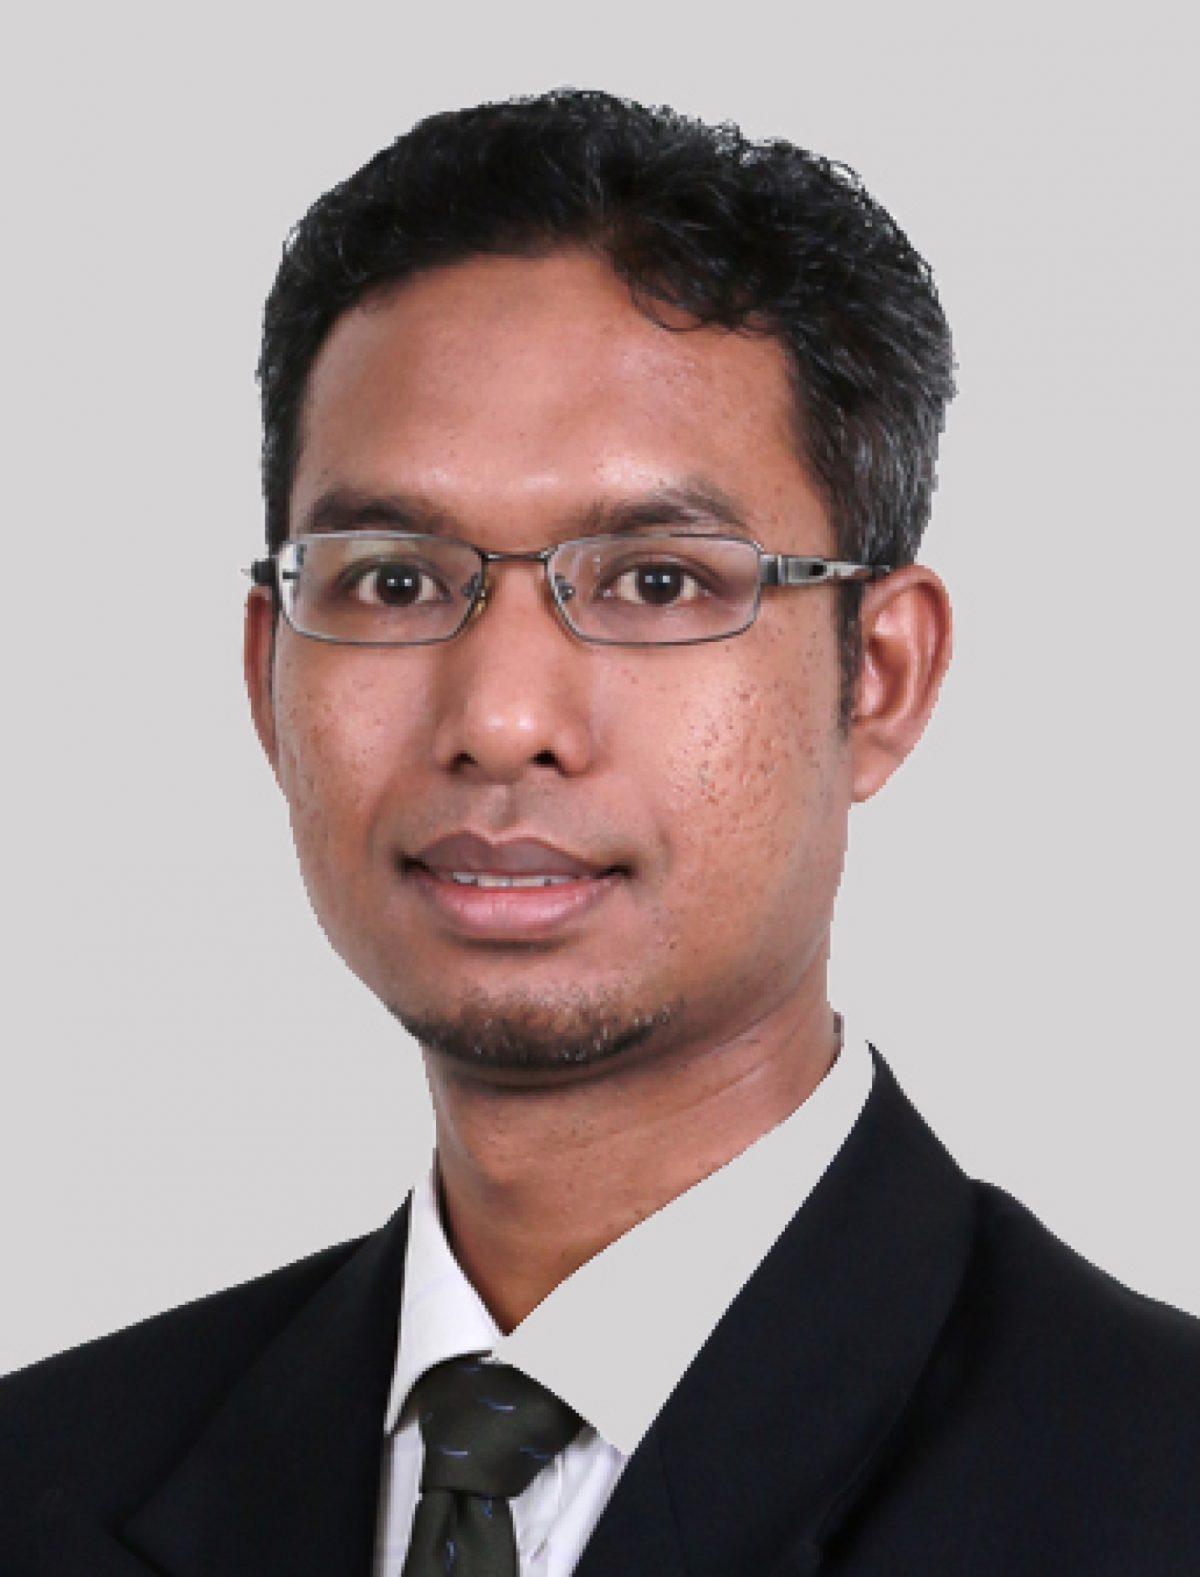 Assoc. Prof. Dr. Amir Shaharuddin